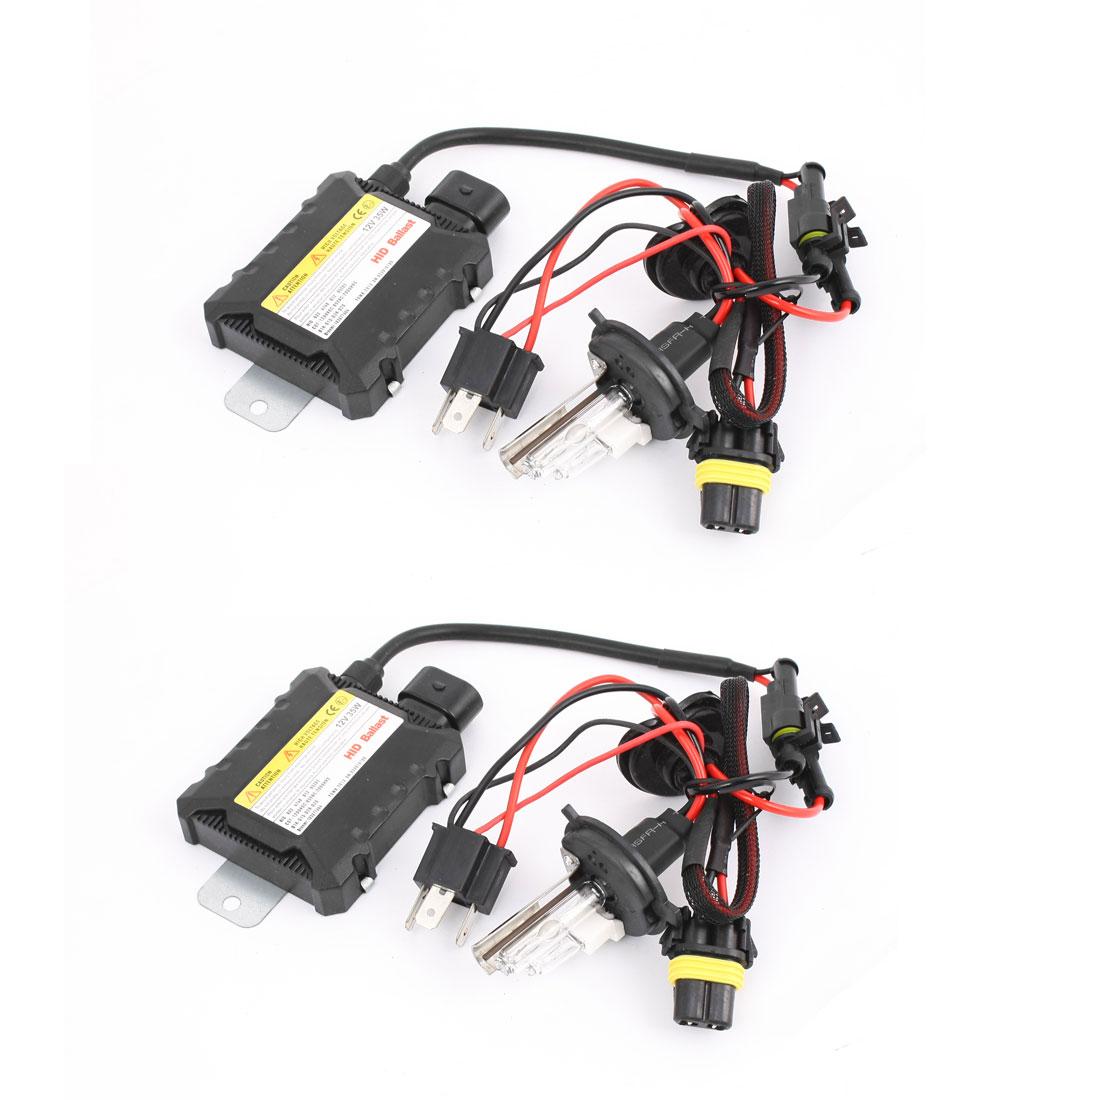 2 Pcs 12V 35W HID Conversion Kit H4 4300K Xenon Light w Slim Ballasts